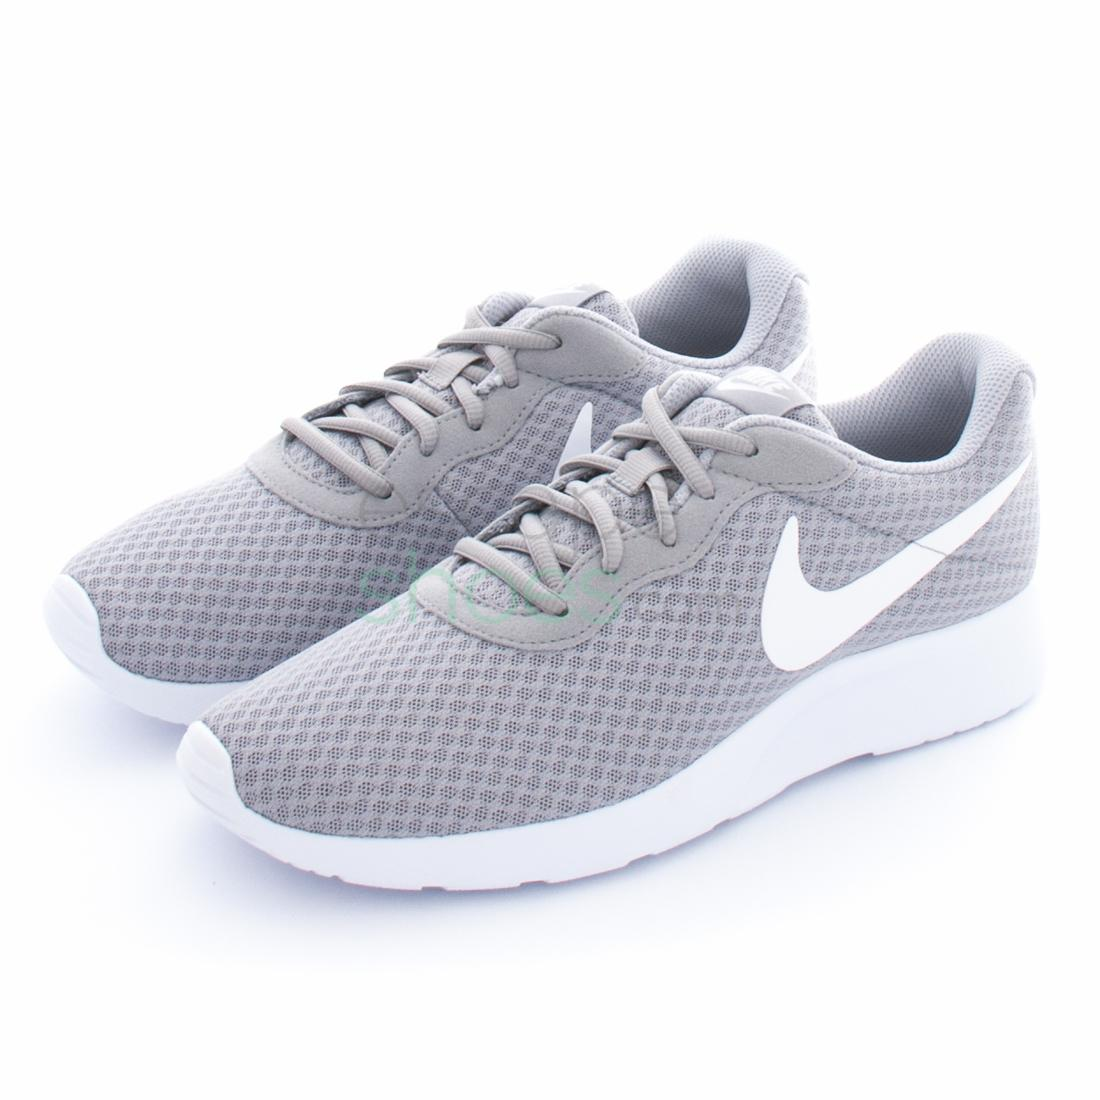 c21576c0c6 Buy your Sneakers NIKE Tanjun Wolf Grey White 812654 010 here ...